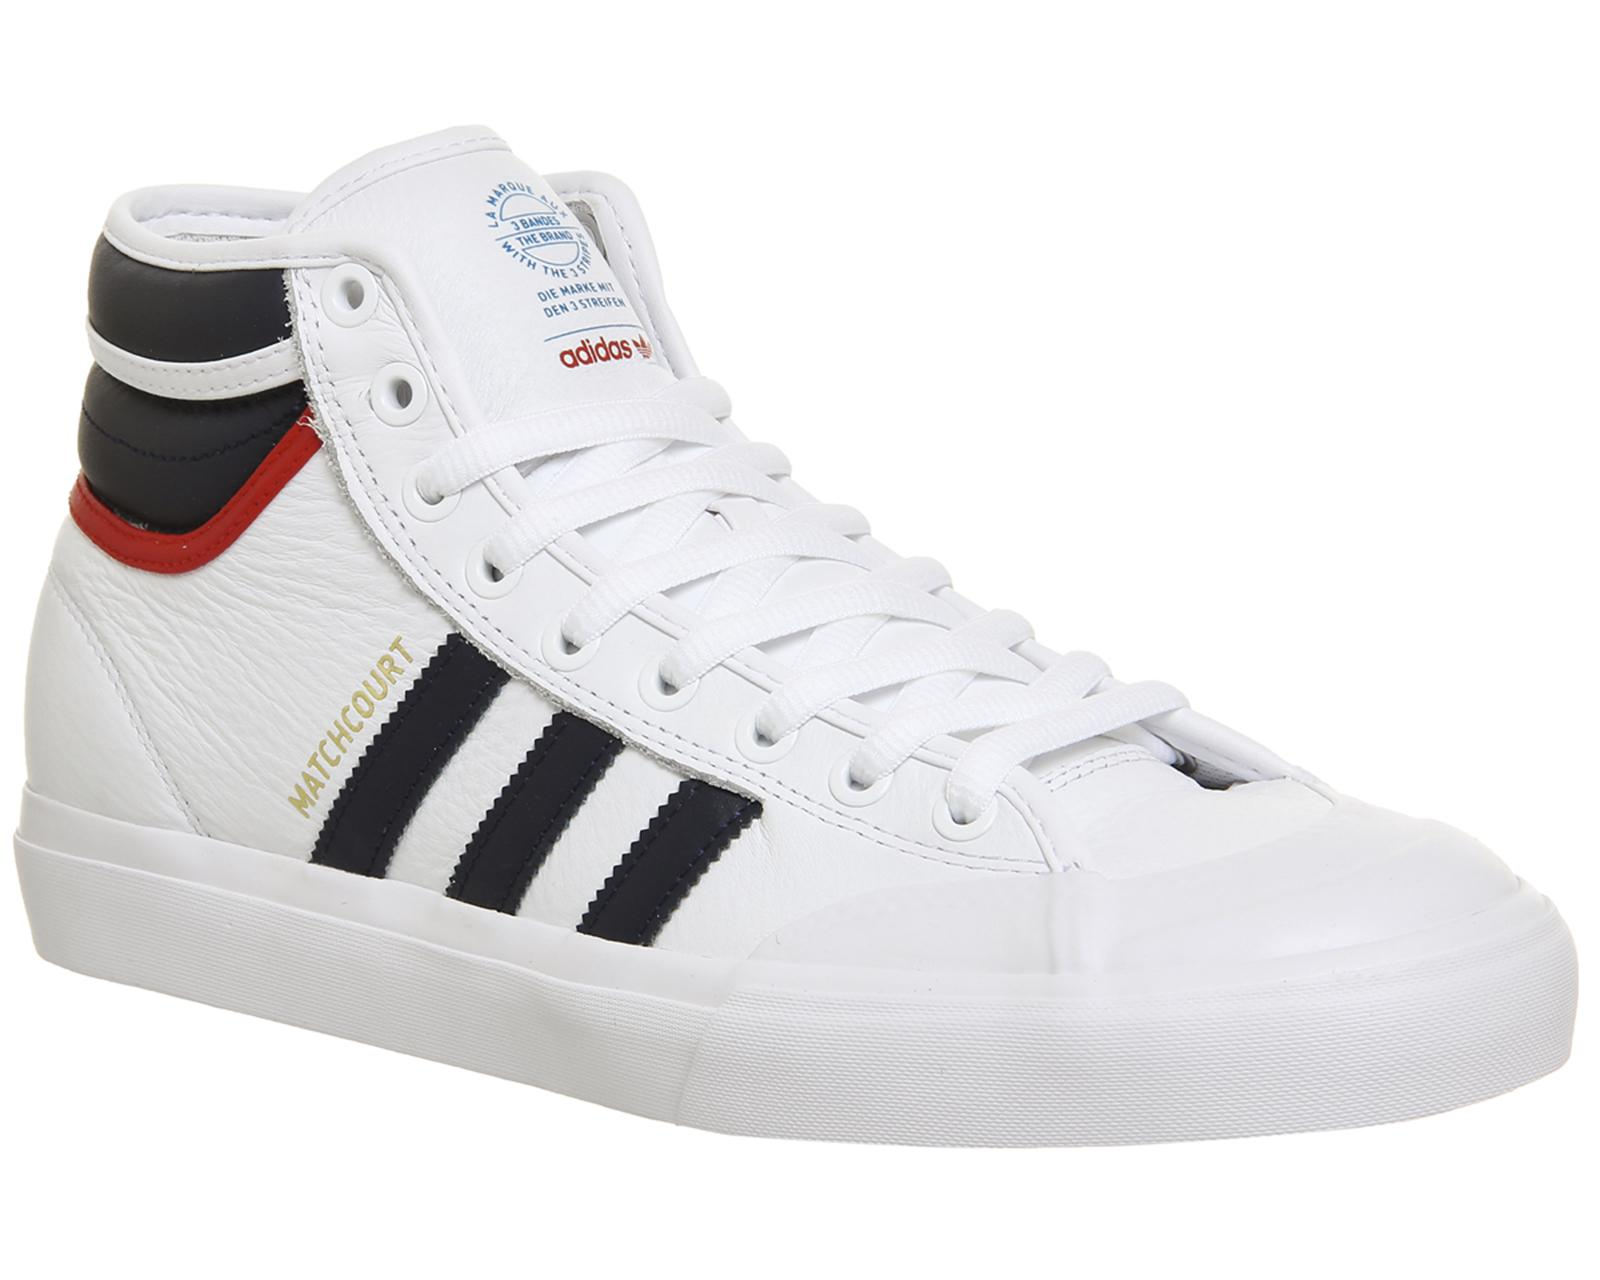 Adidas Matchcourt High Rx2 in White for Men - Lyst 5730dcf31